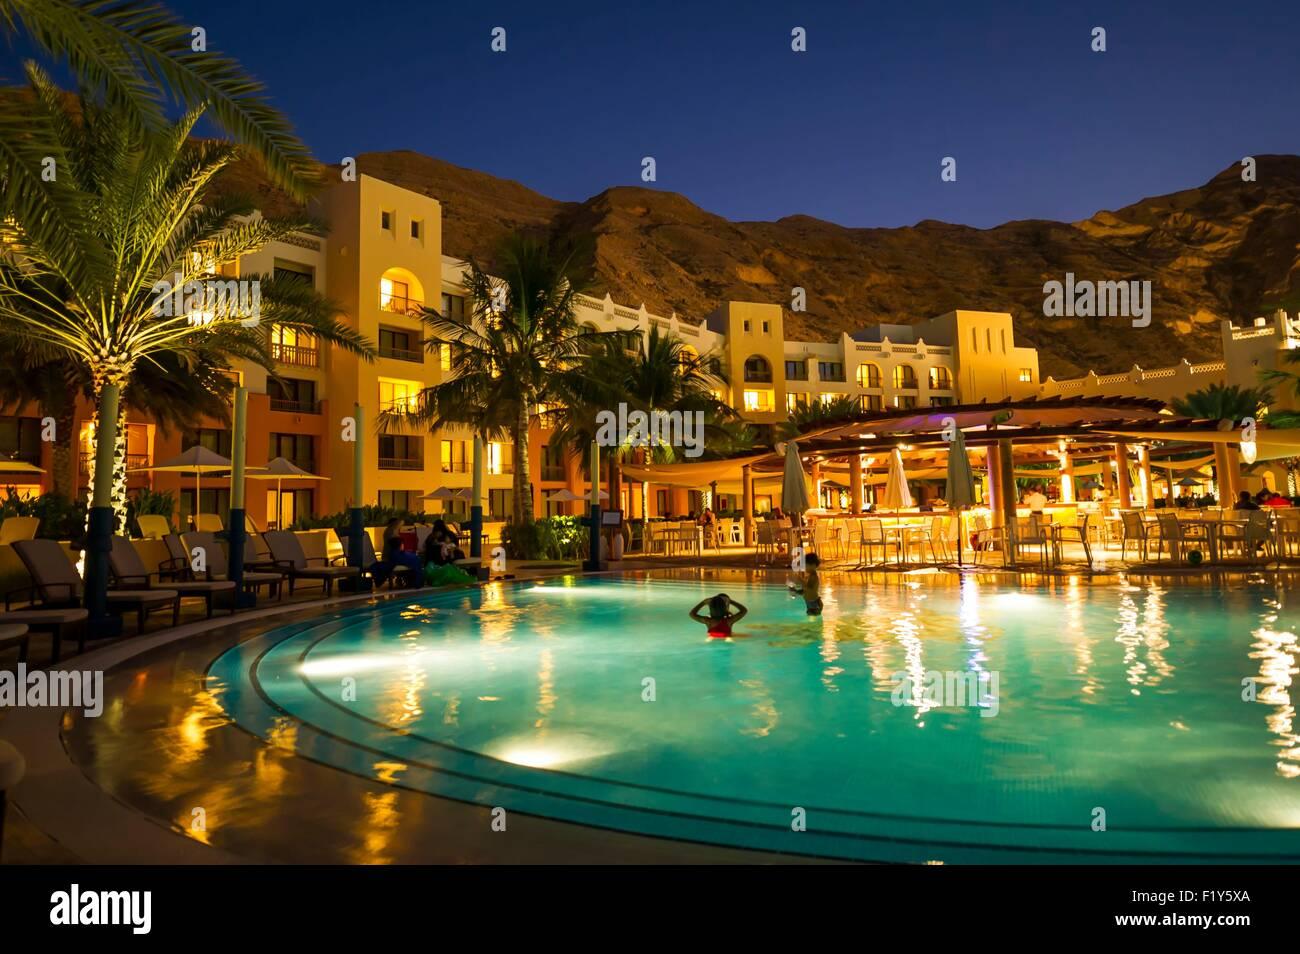 Oman, Moscato, Barr Al Jissah Resort, Shangri La Hotel Immagini Stock